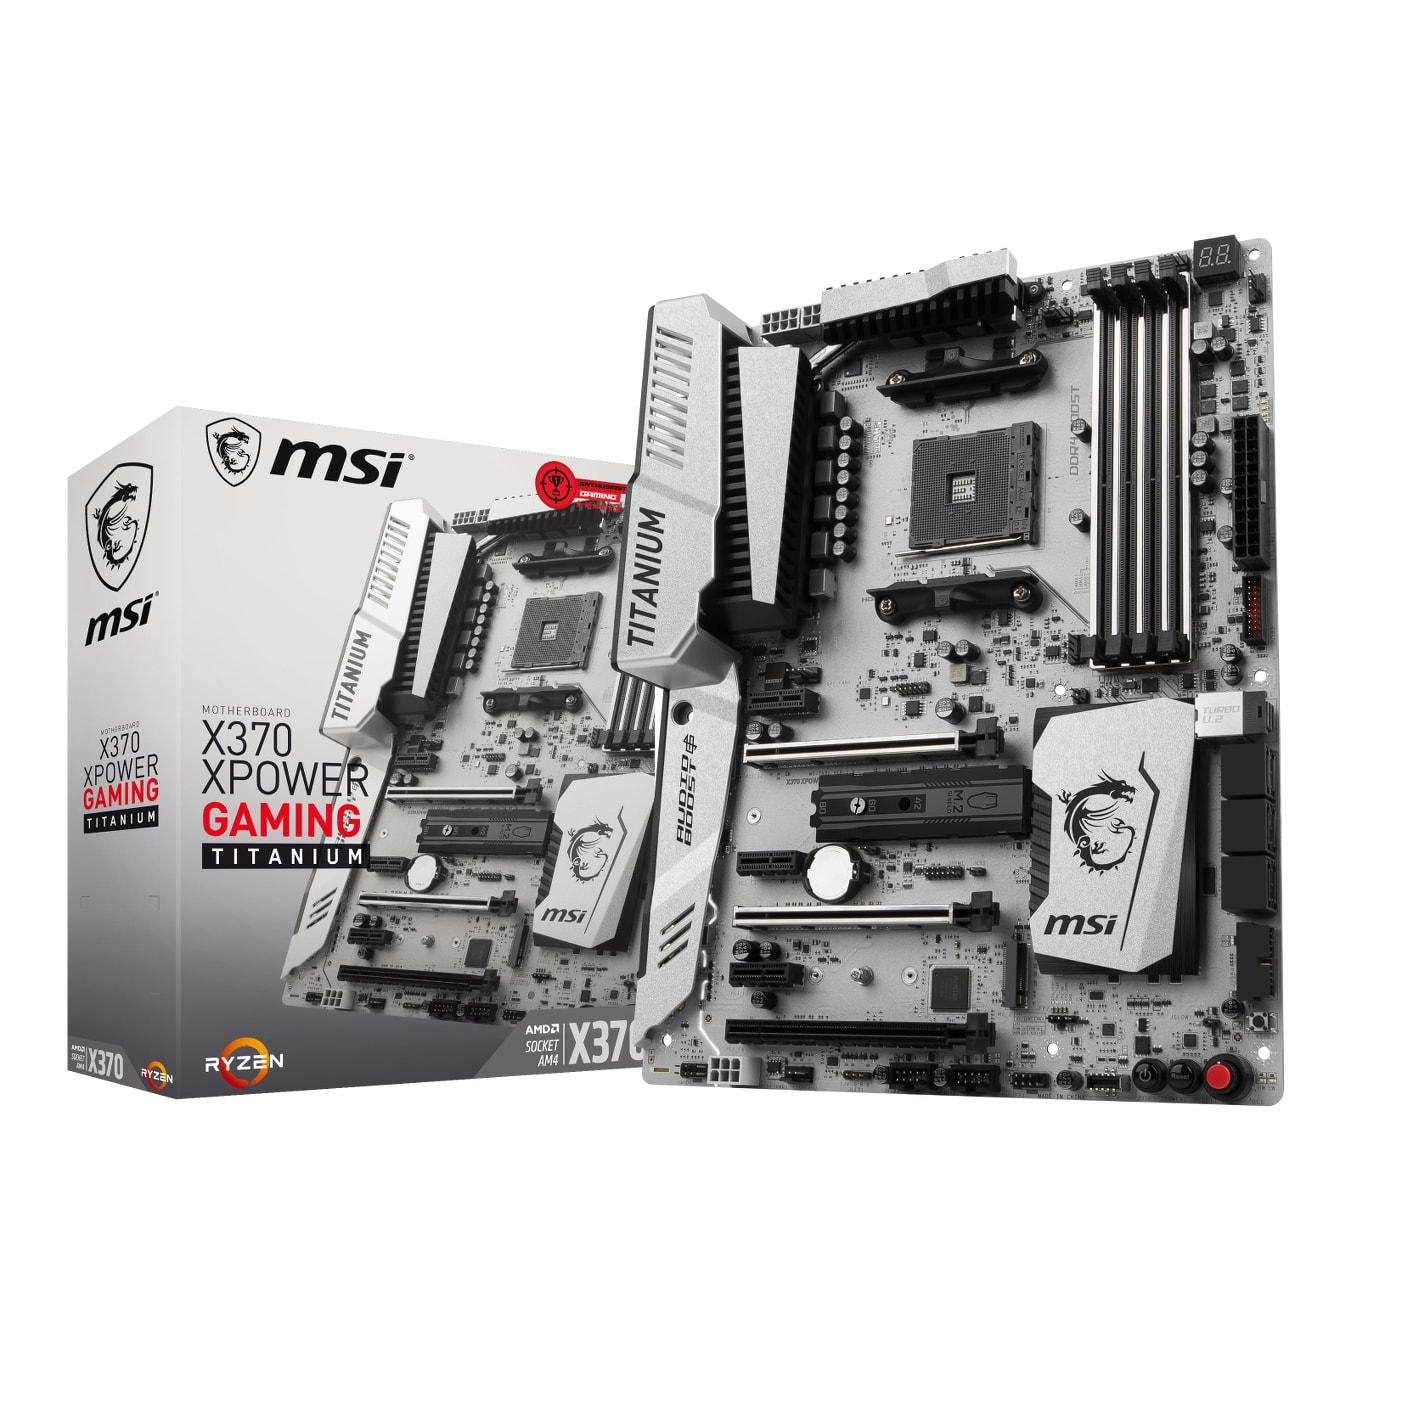 MSI X370 XPOWER GAMING TITANIUM ATX DDR4 - Carte mère MSI - 0